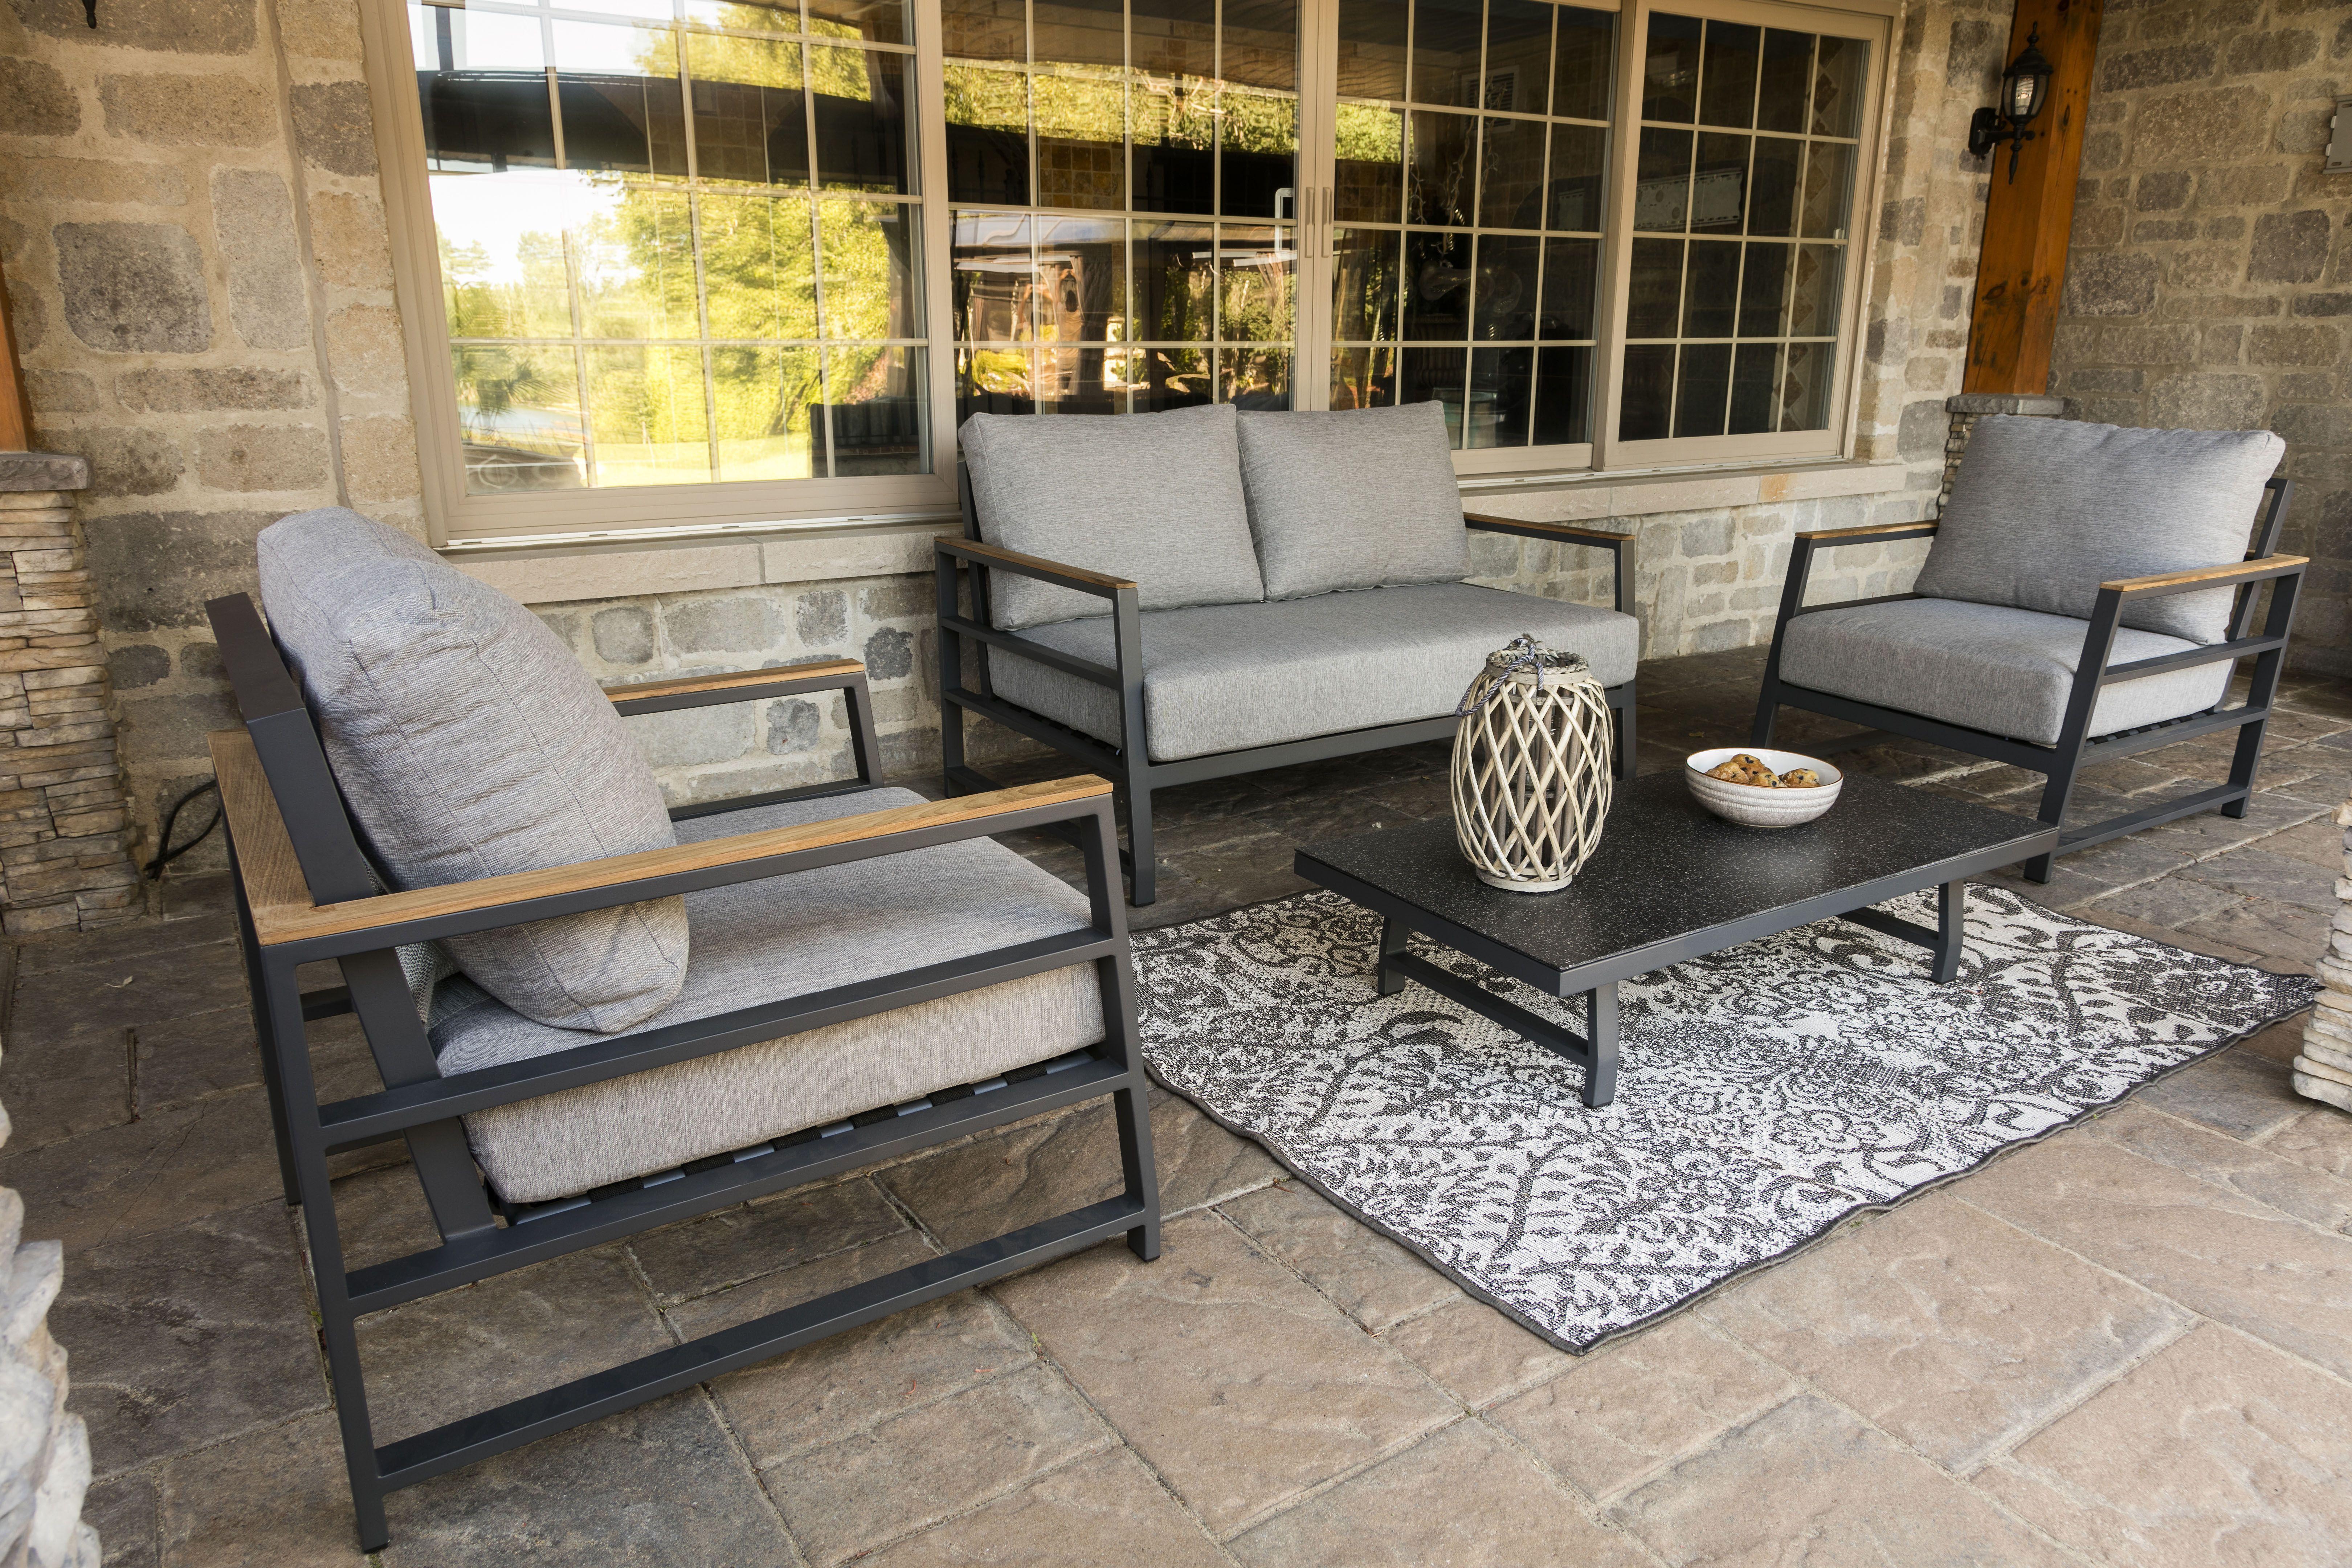 Salon Exterieur London Outdoor Deep Seating Outdoor Furniture Sets Outdoor Furniture Furniture Sets